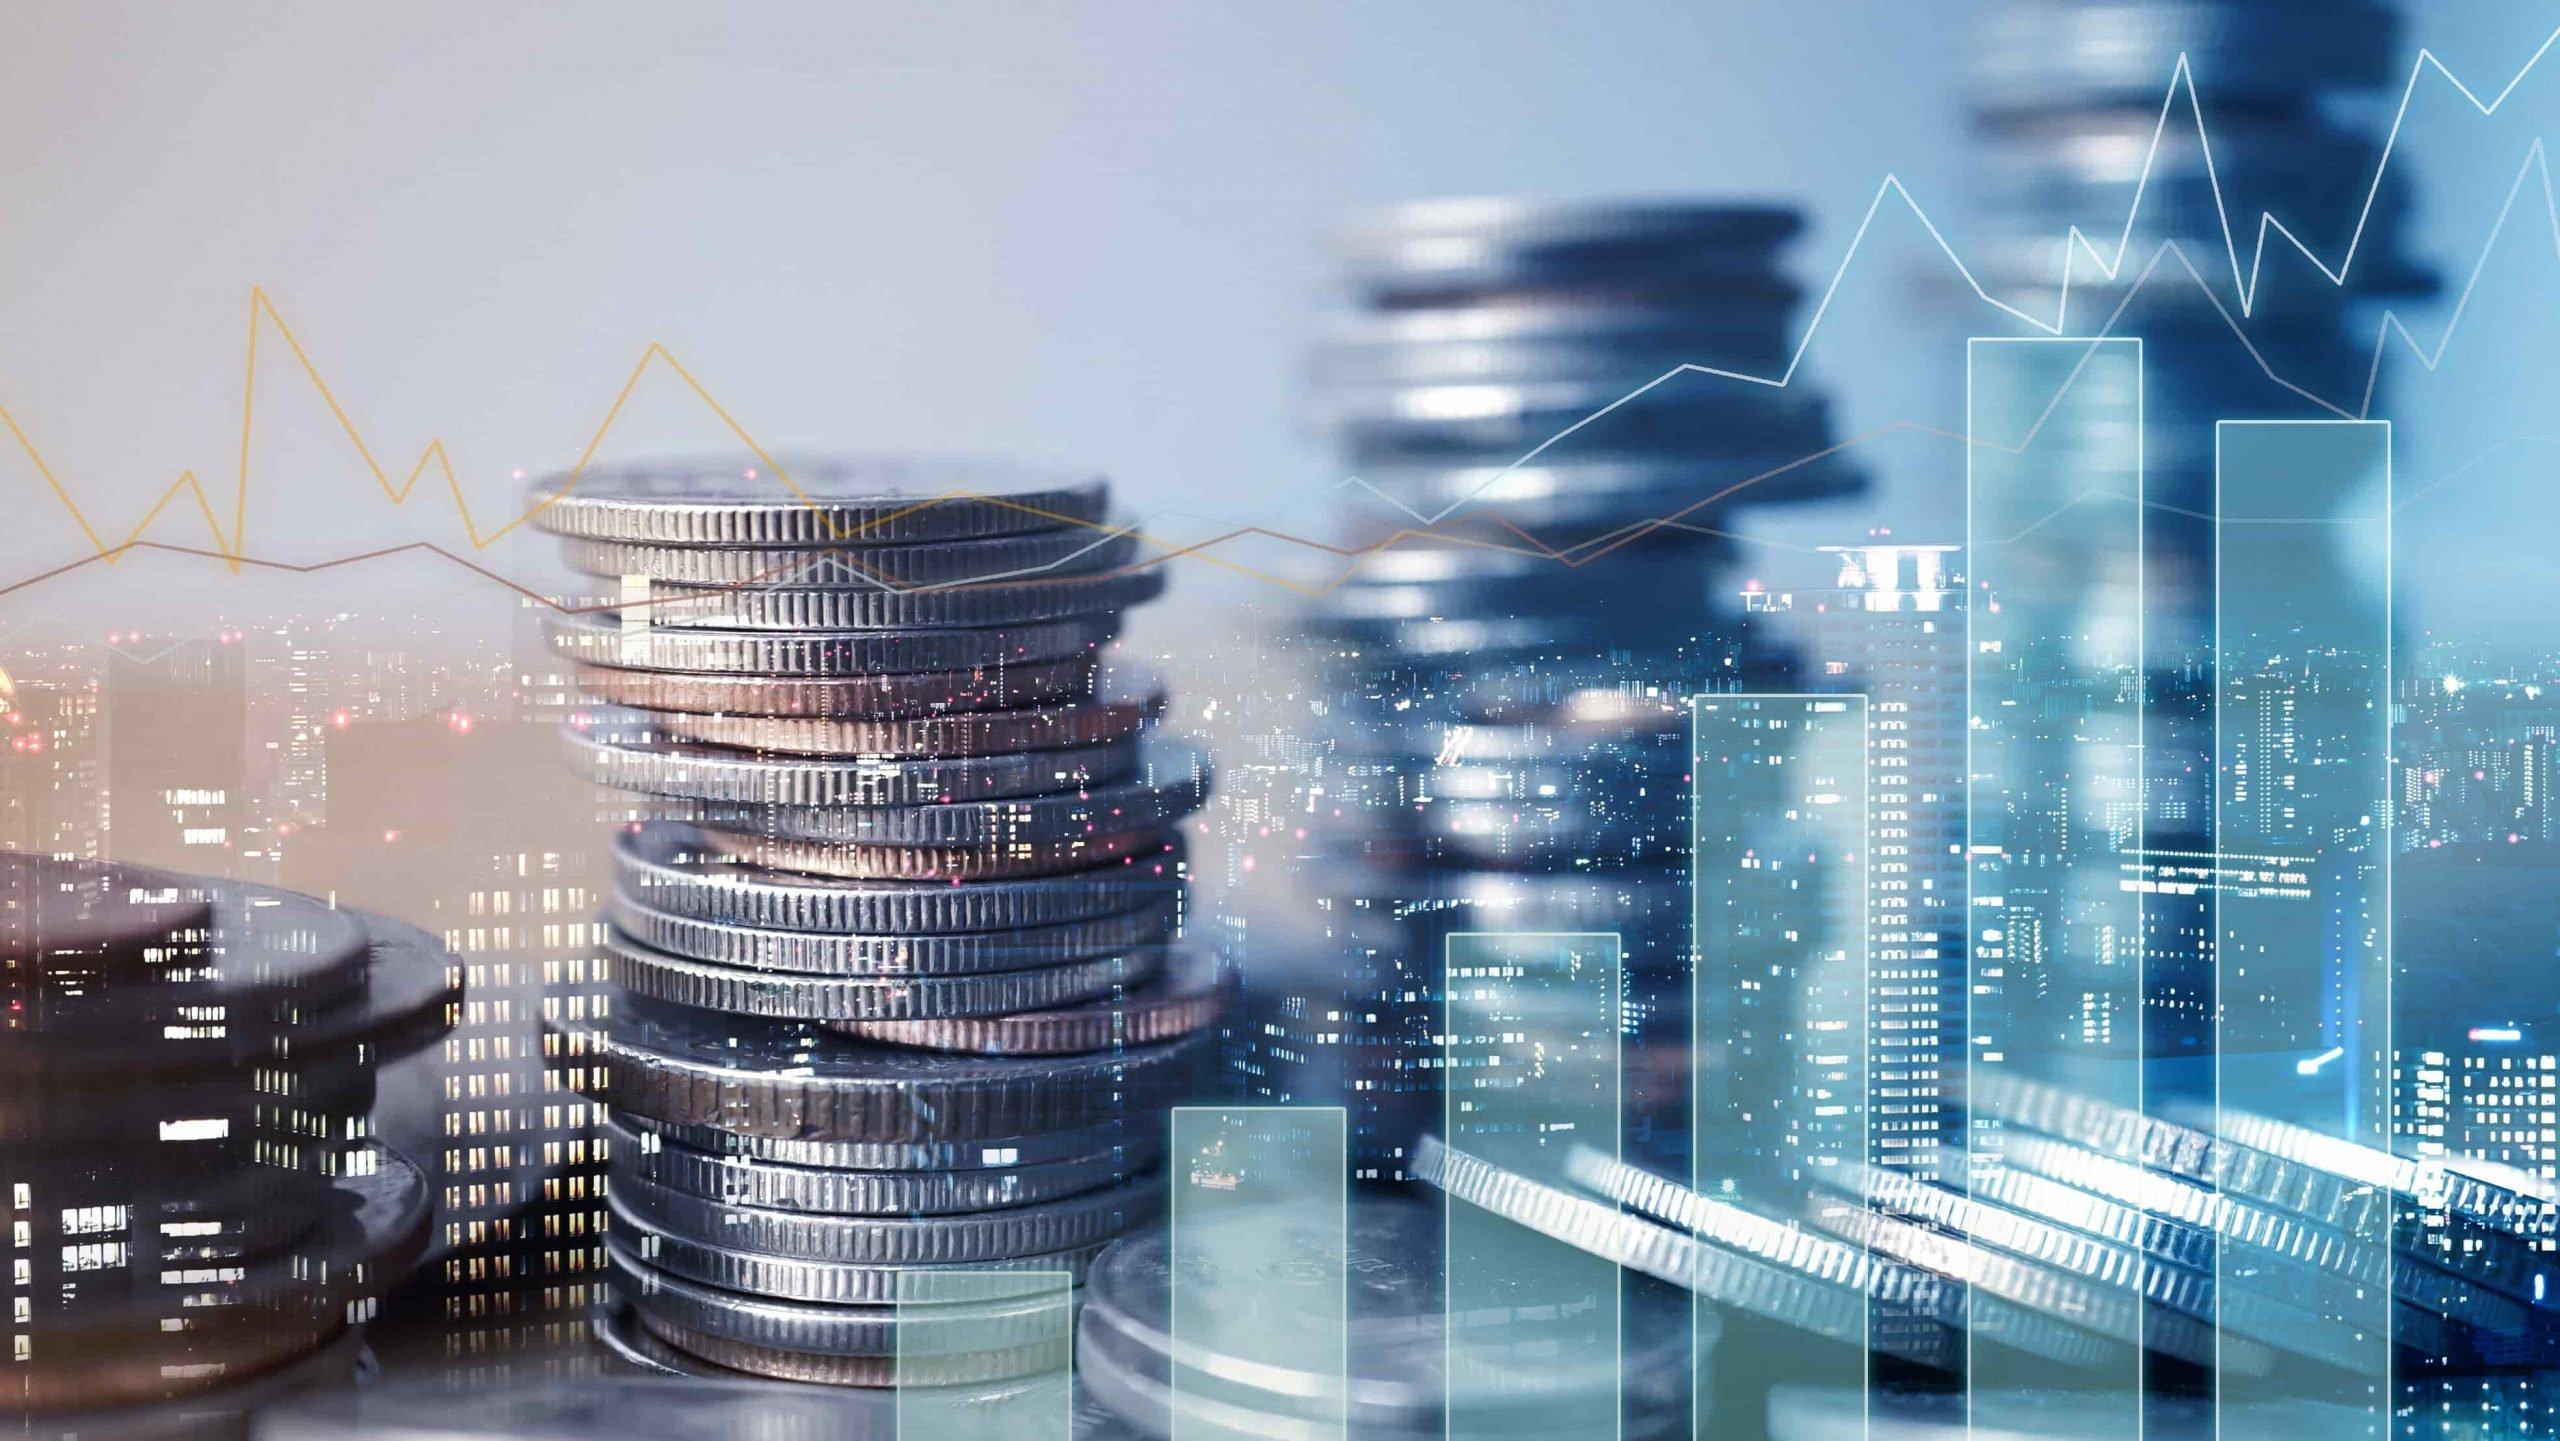 Financiamento Empresarial - Entenda O Que é E Descubra O Necessário Para Conseguir O Seu!